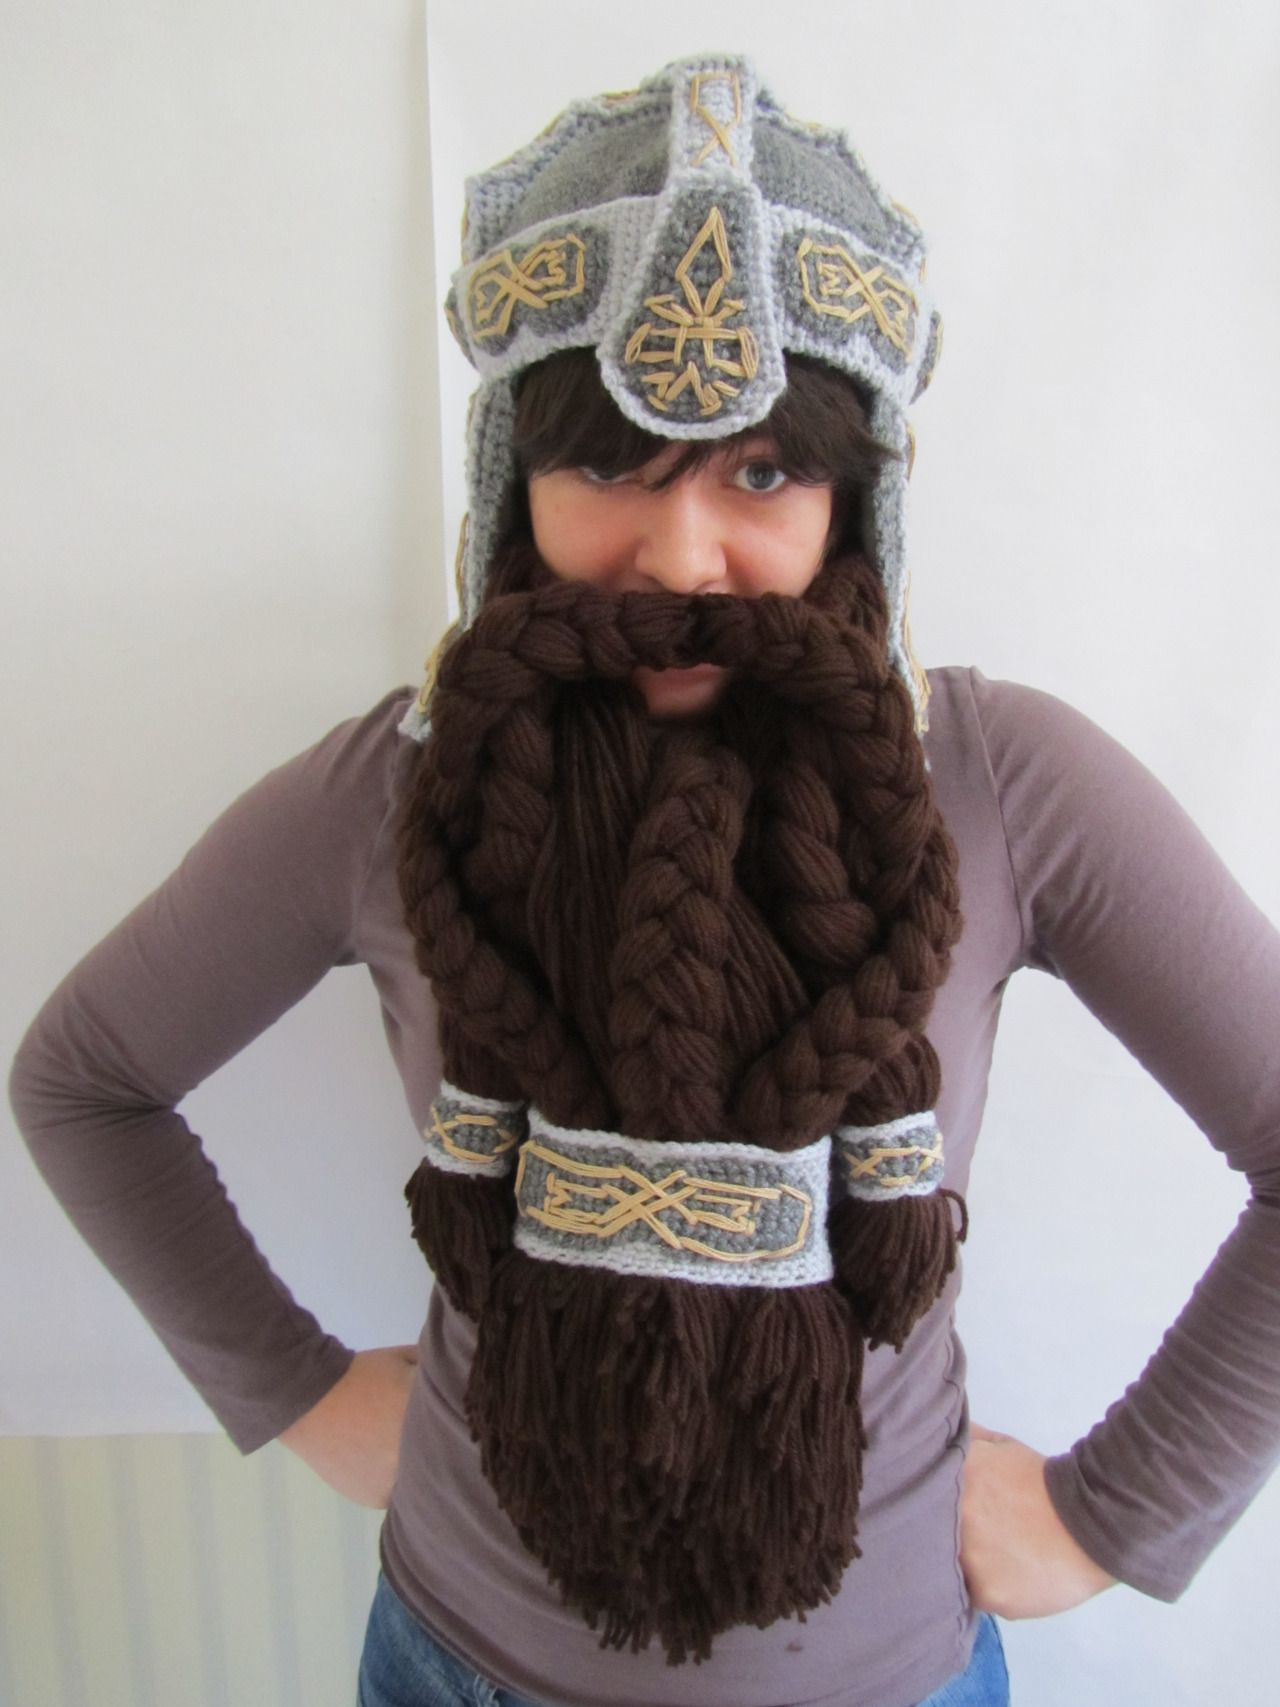 9d1b0a7585d Dwarf Beard and hat made with yard. Gimli LOTR